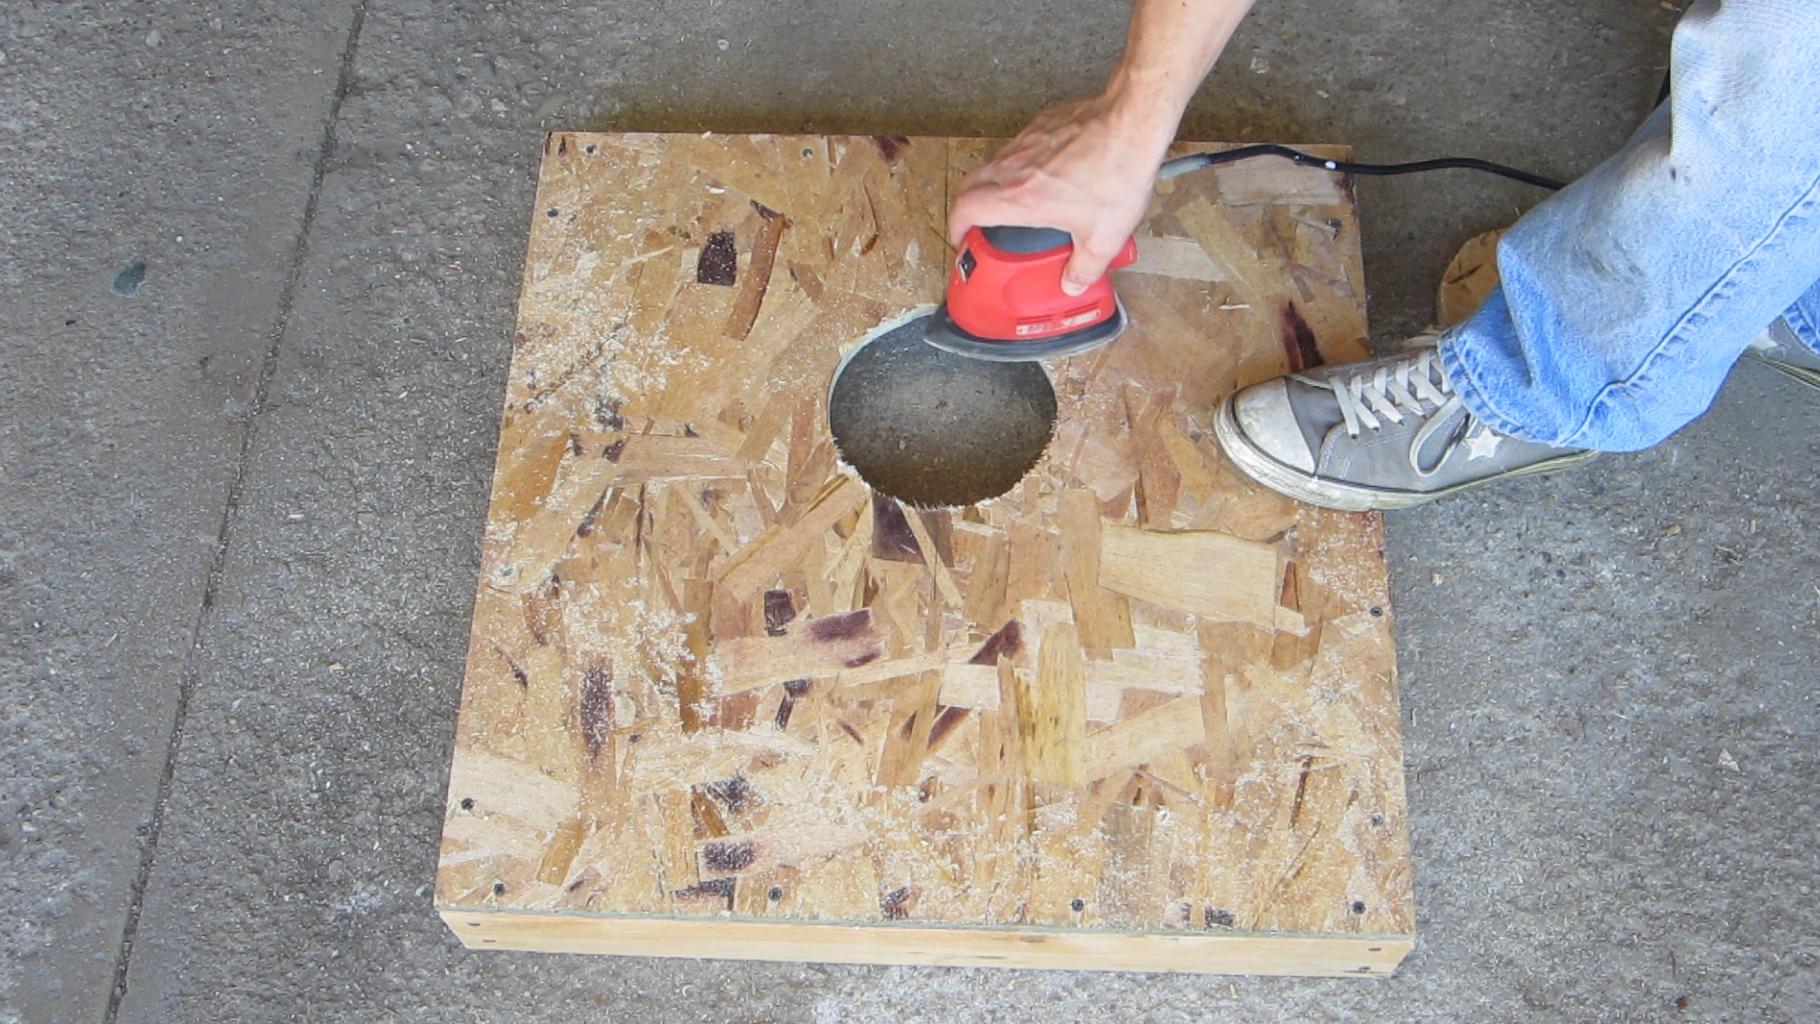 Cut a 6 Inch Hole in One Board